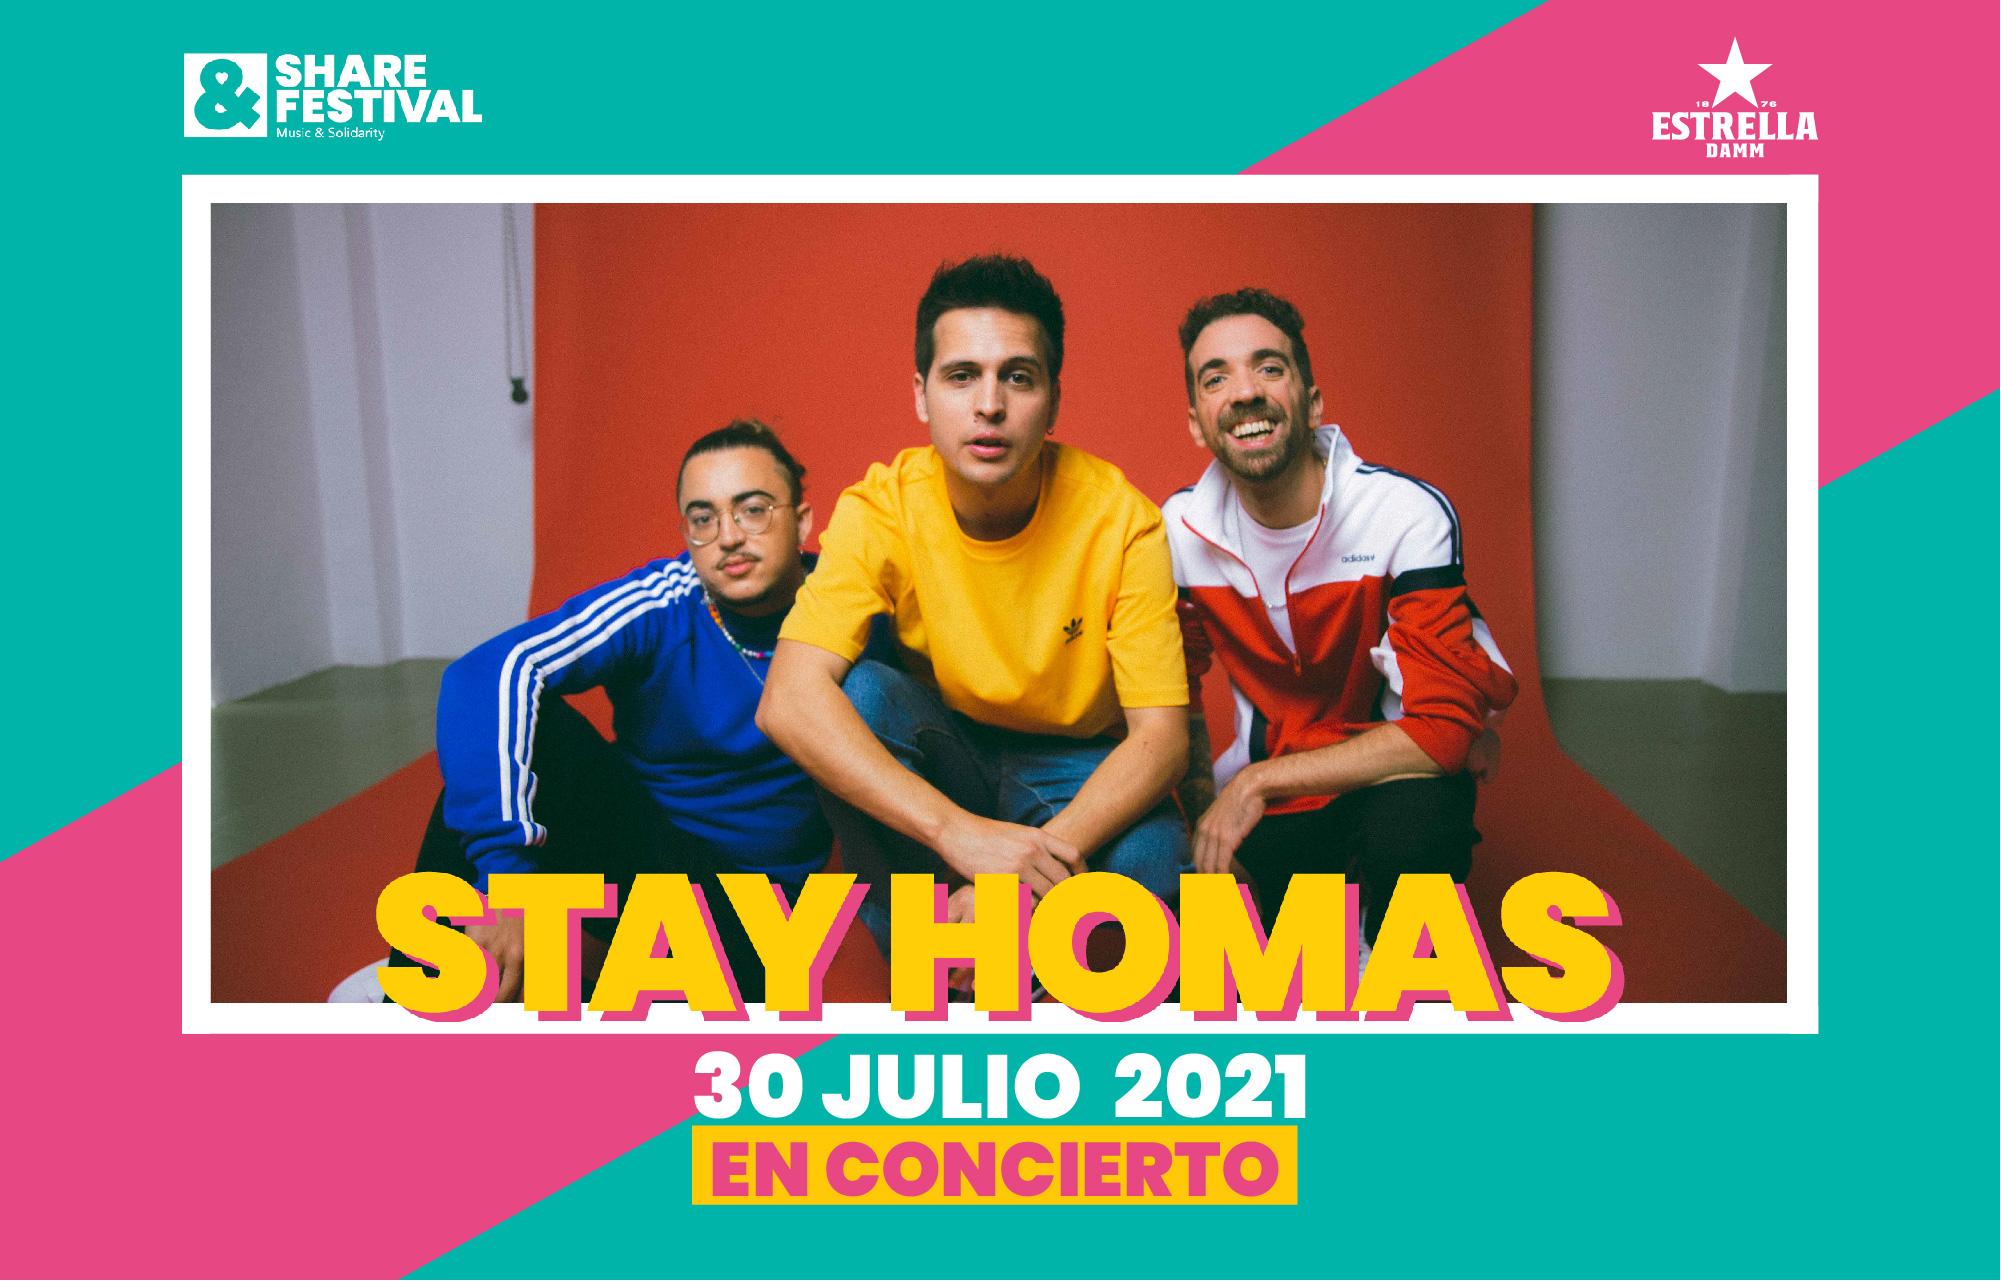 stay homas share festival 2021 16199744026948664